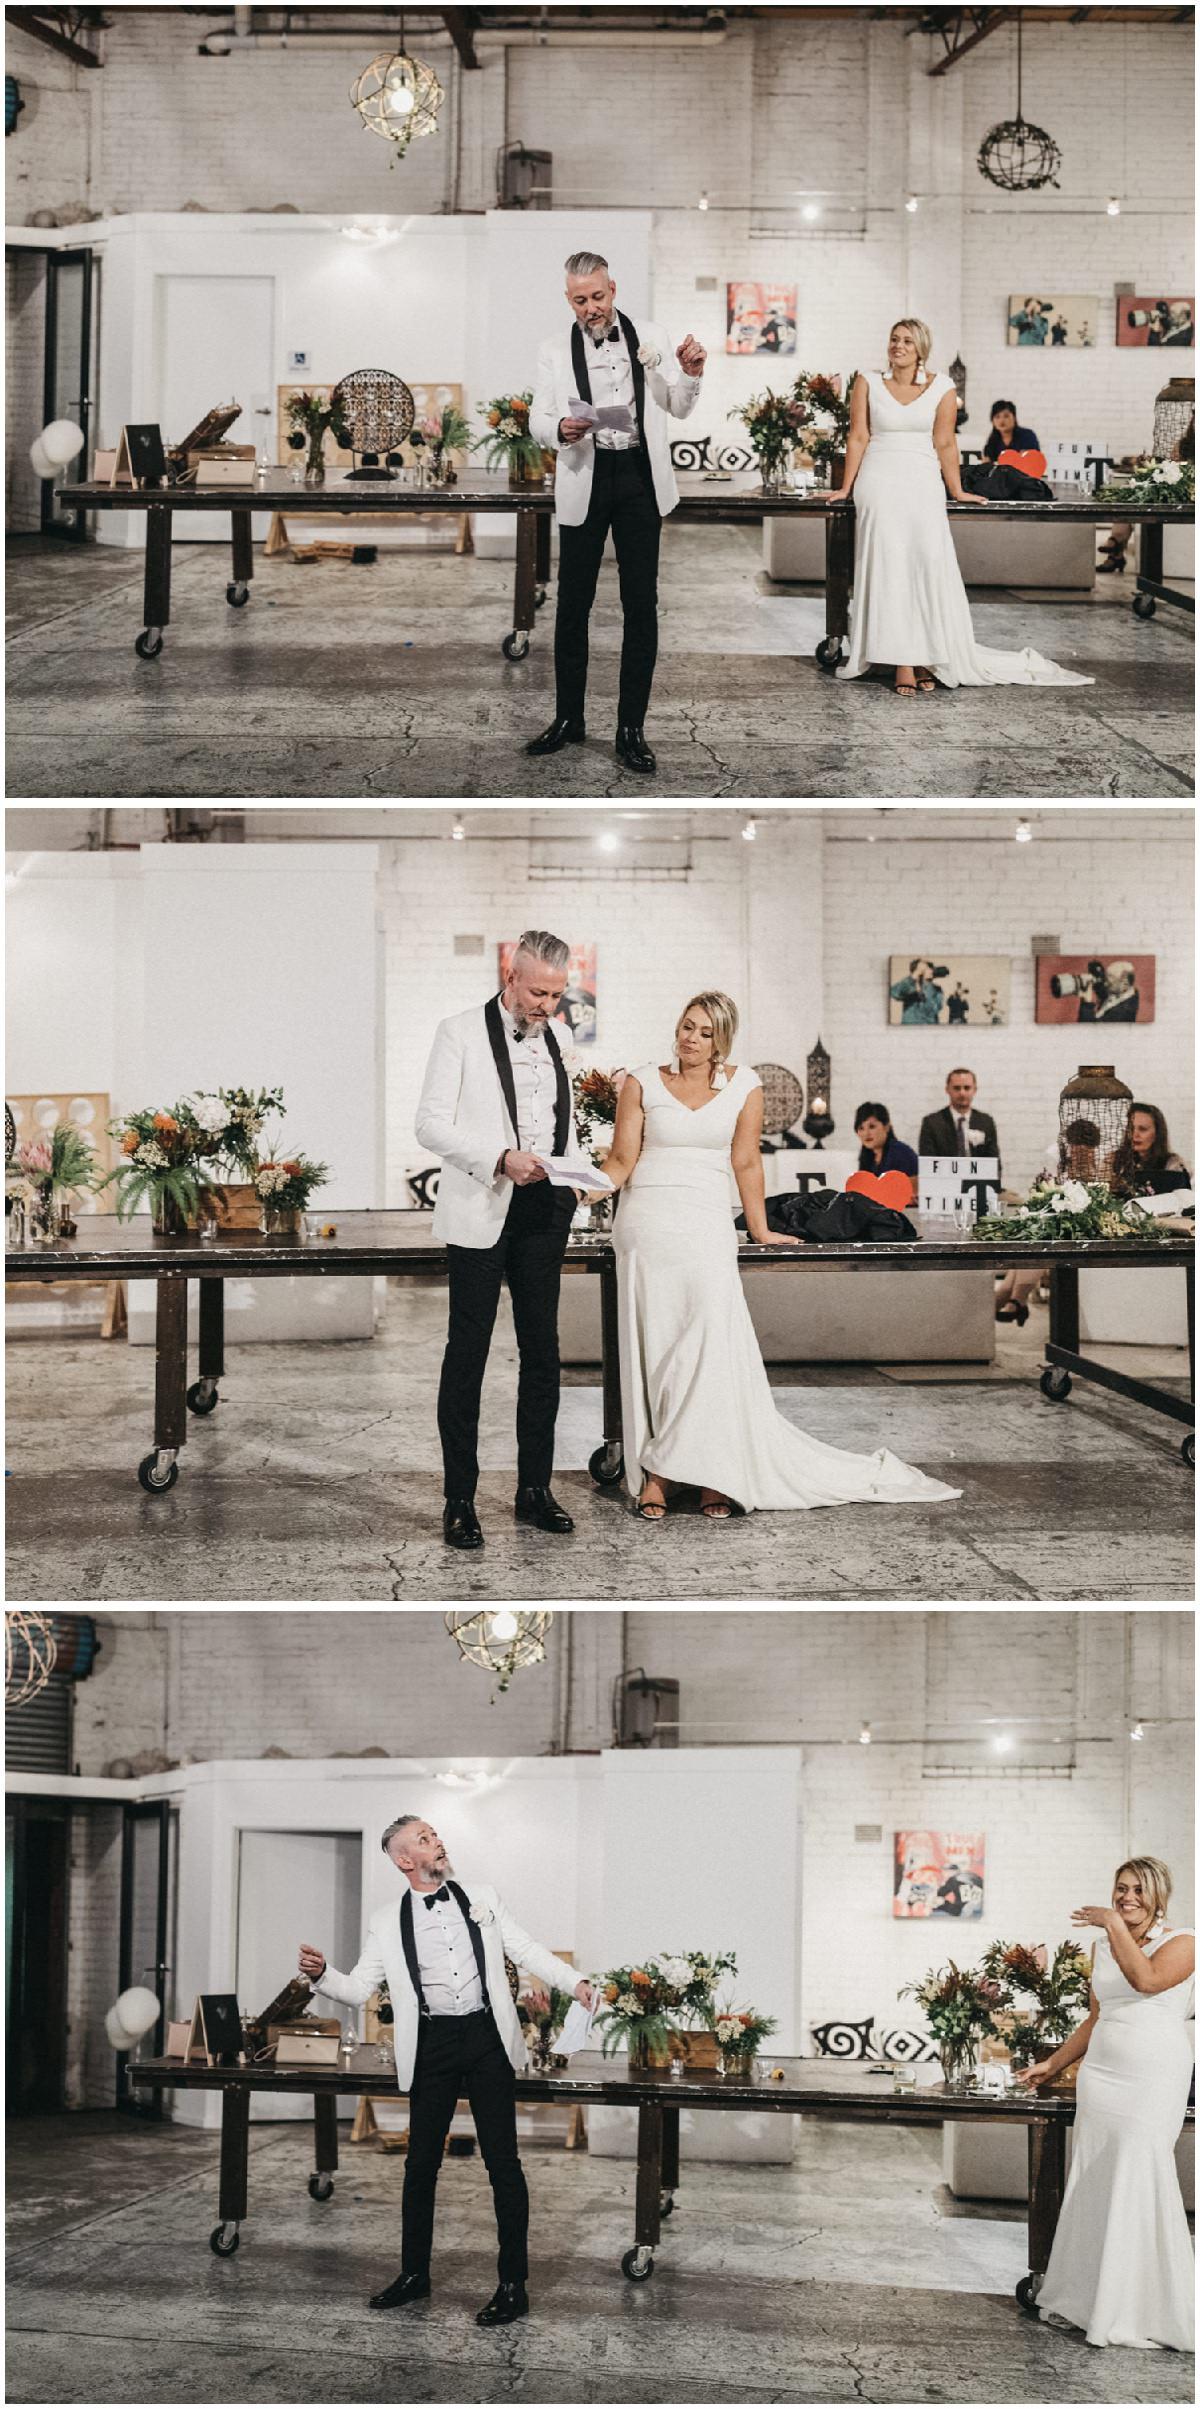 Emily_Tim_Melbourne_Beach_city_wedding_172.jpg